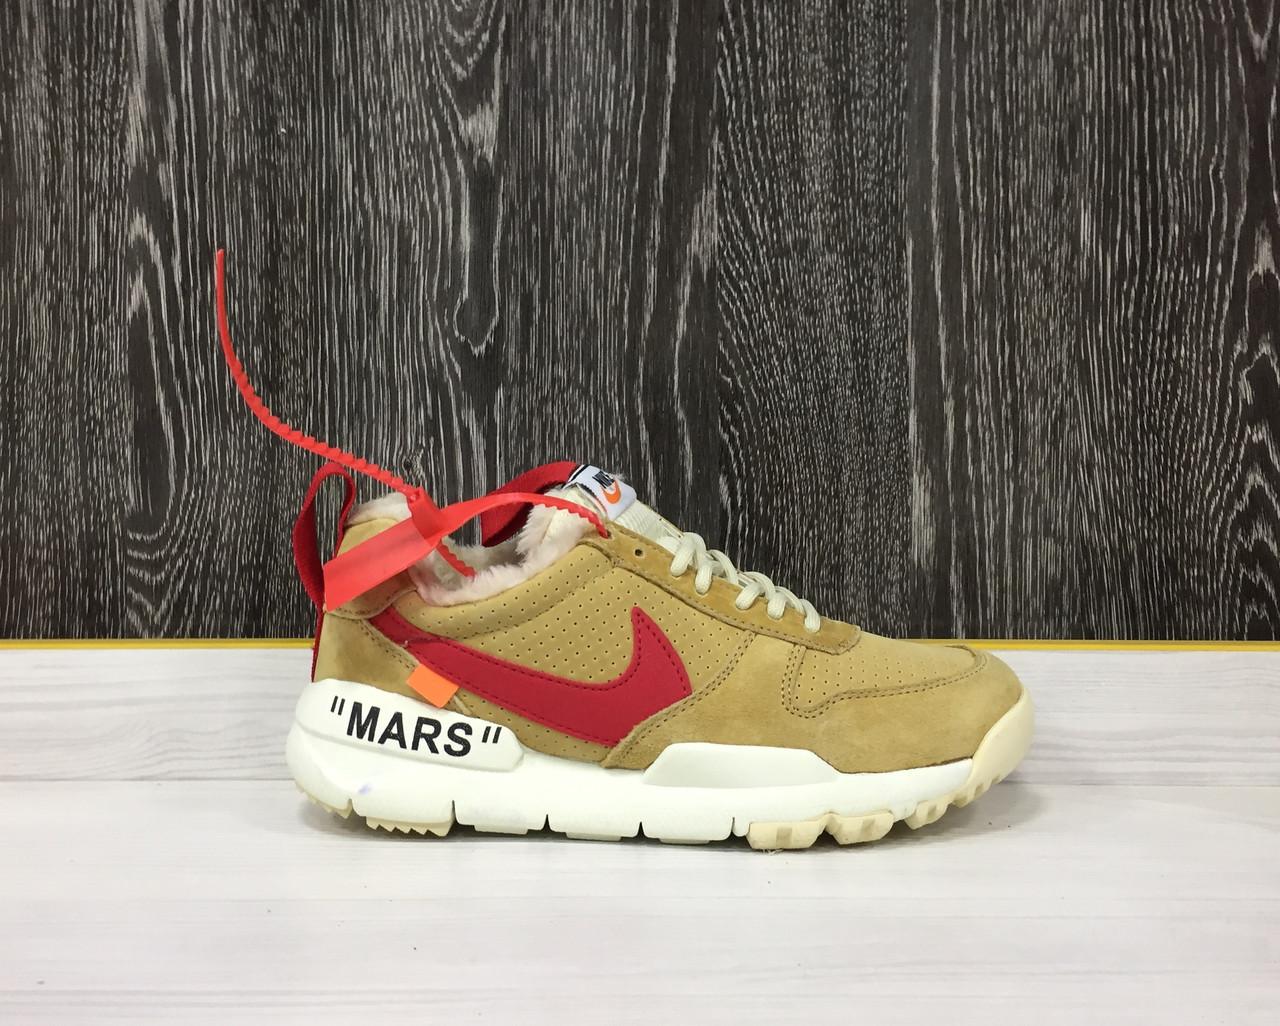 Кроссовки Зимние Nike Mars Yard 2 Low Winter (Brown)